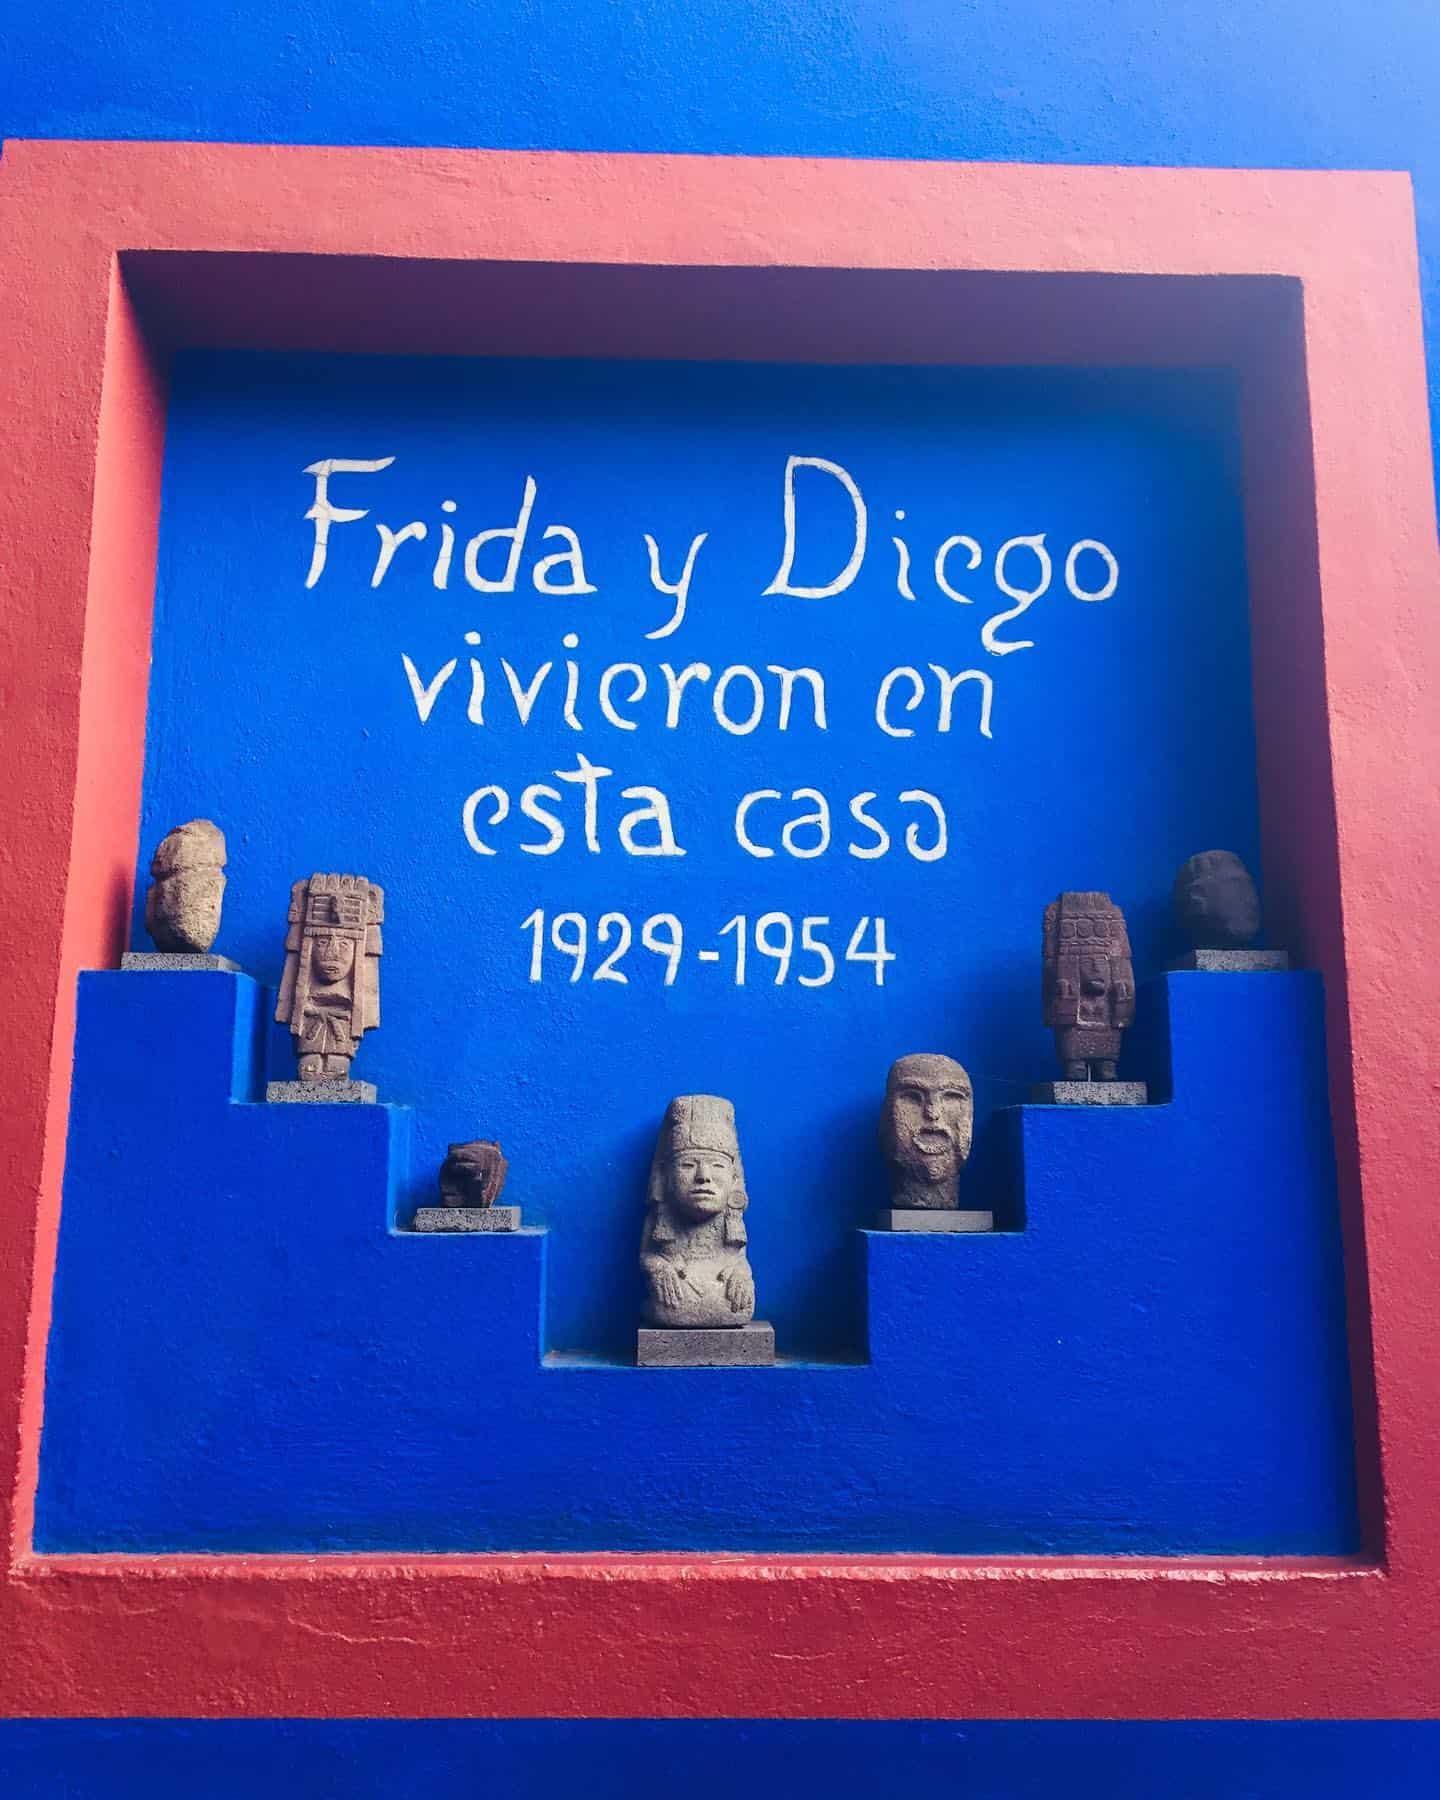 FRIDA KHALO MUSEUM MUSEO CASA AZUL BLUE HOUSE